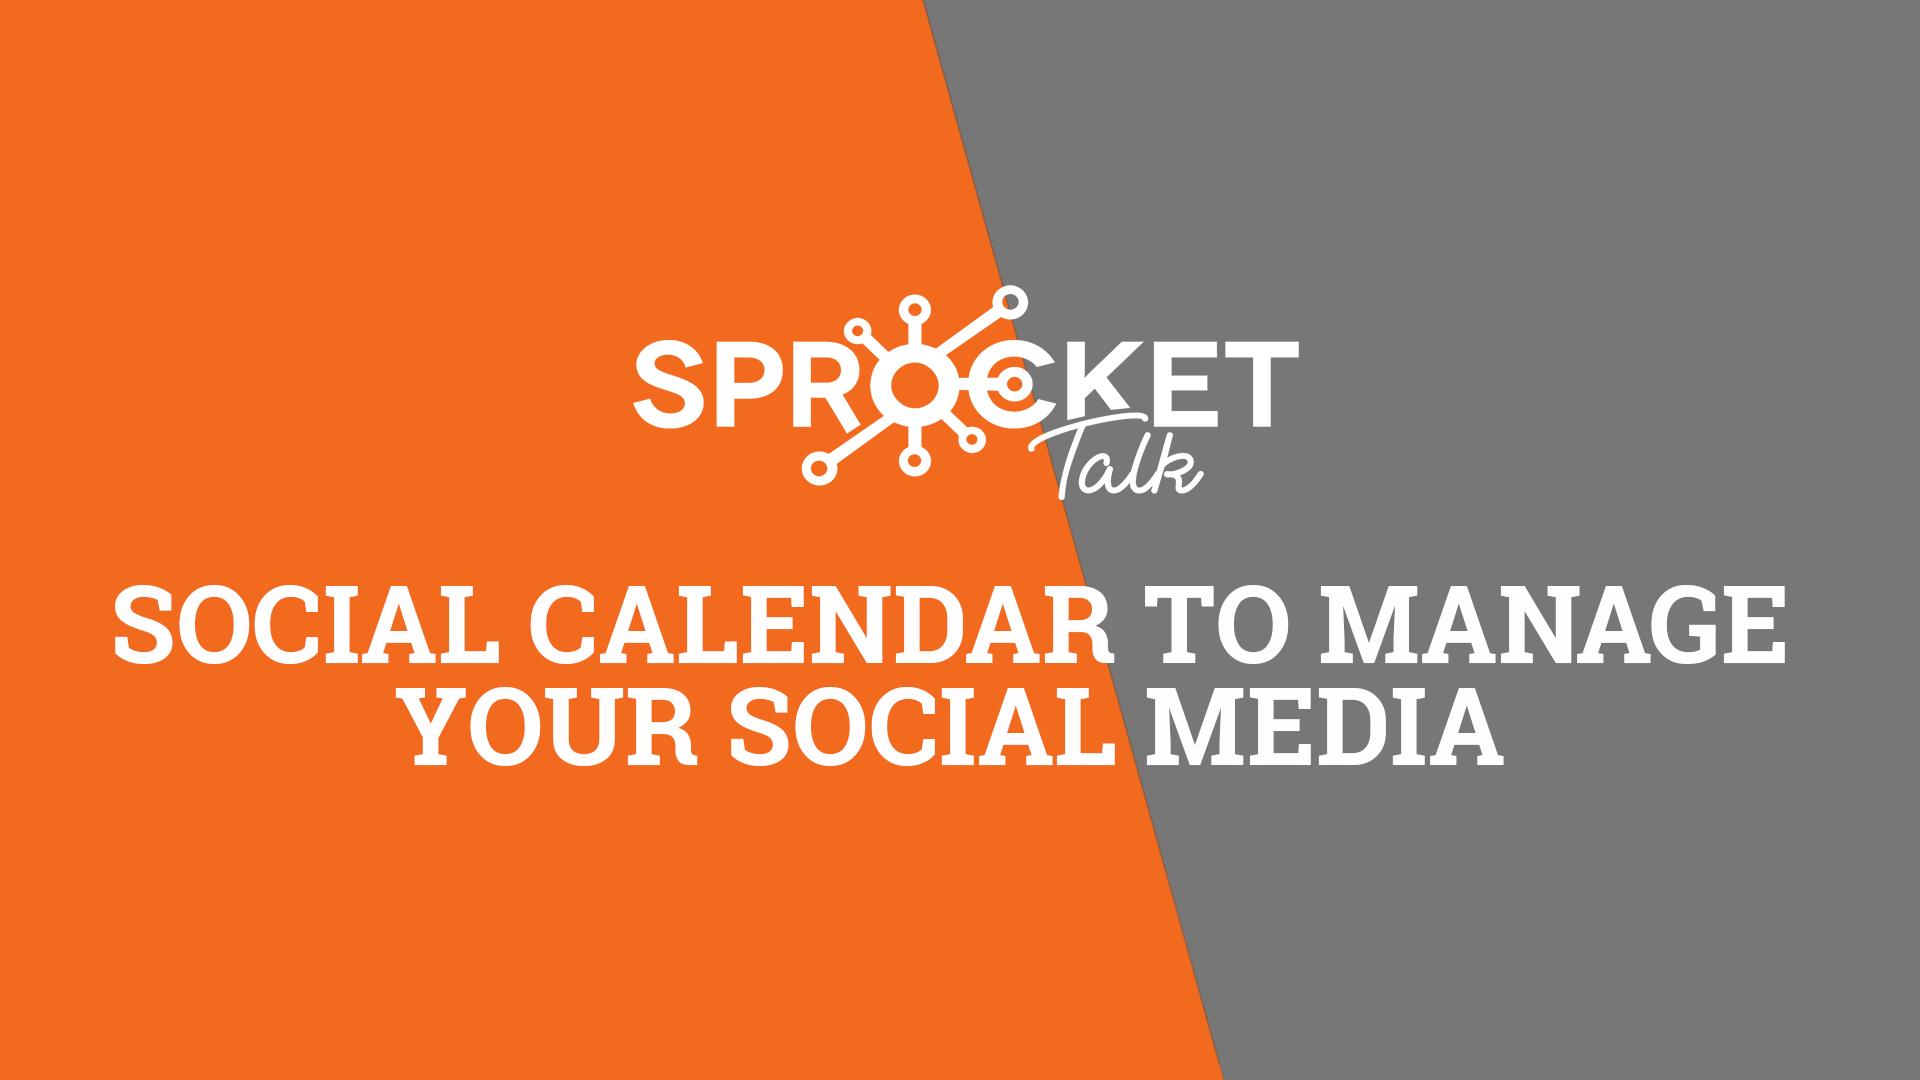 Social Calendar to Manage Your Social Media